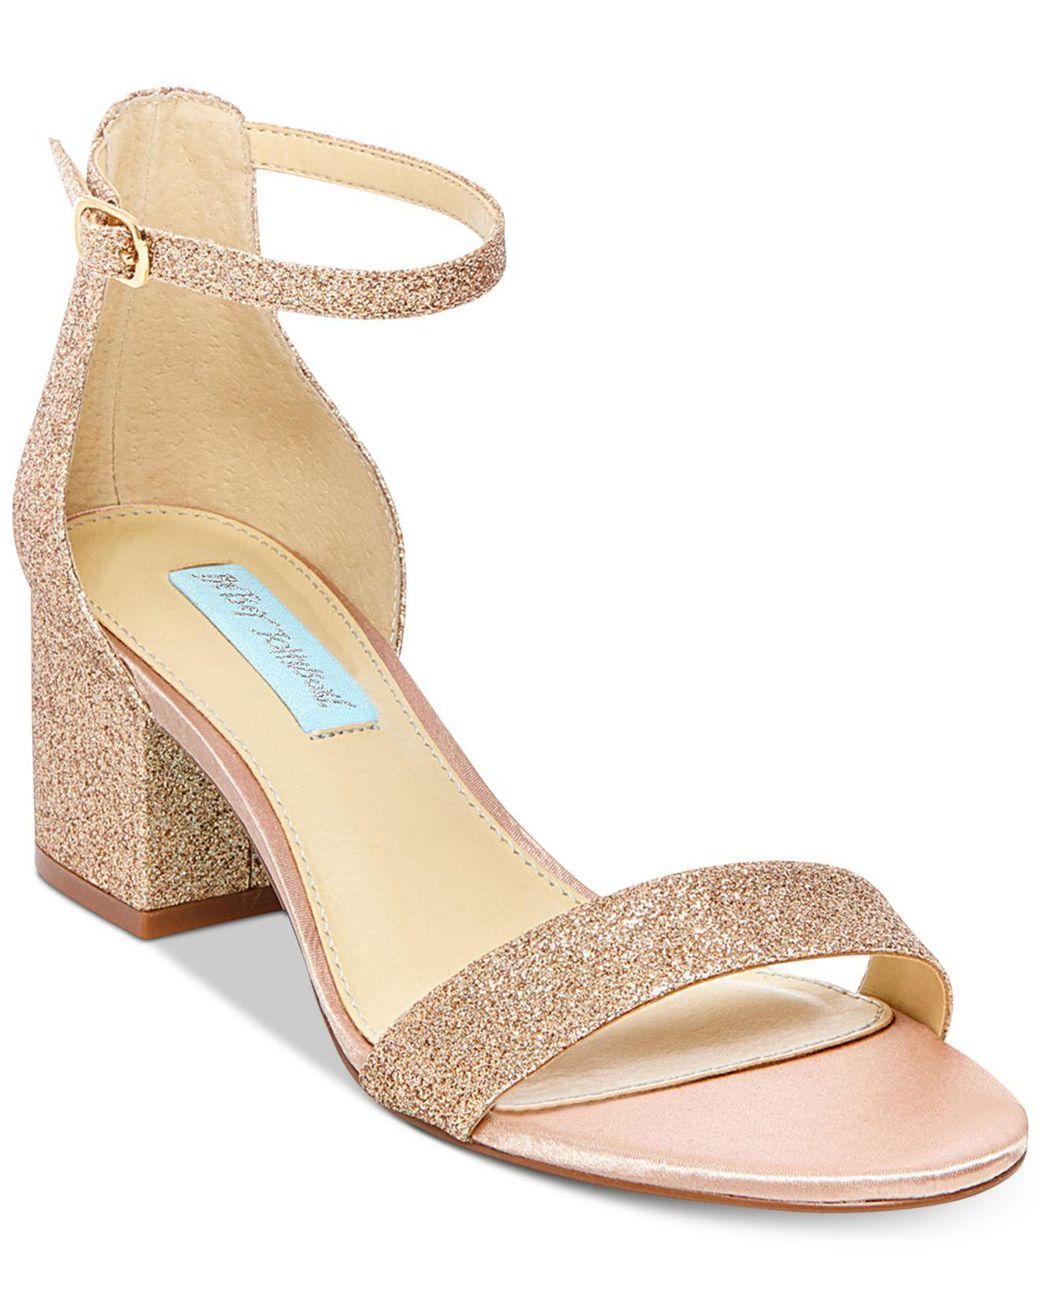 cab041adf44 Lyst - Betsey Johnson Miri Evening Sandals in Metallic